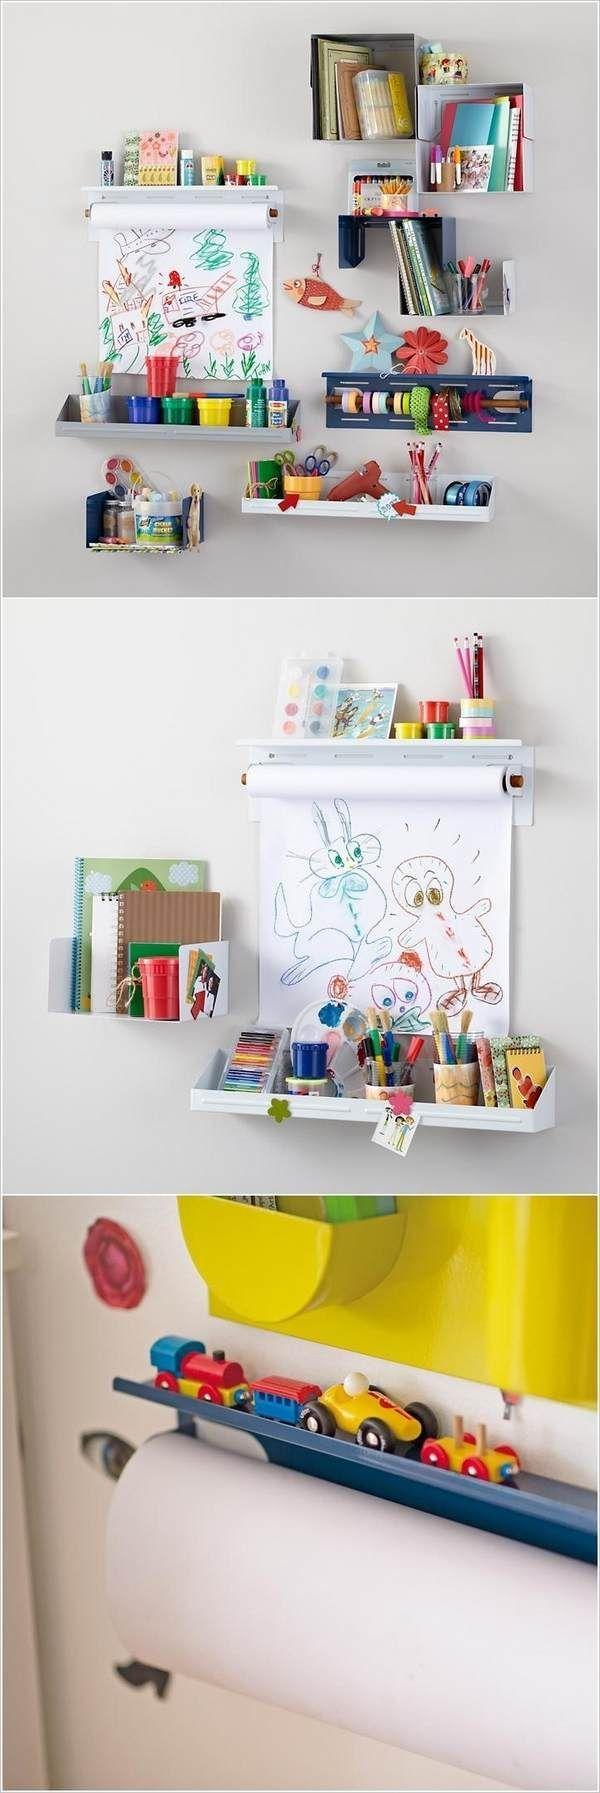 Space Saving Playroom Wall Storage Ideas Wall Shelves Playroom Wall Mounted Organizers Playroom Organization Kids Rooms Diy Kids Room Organization